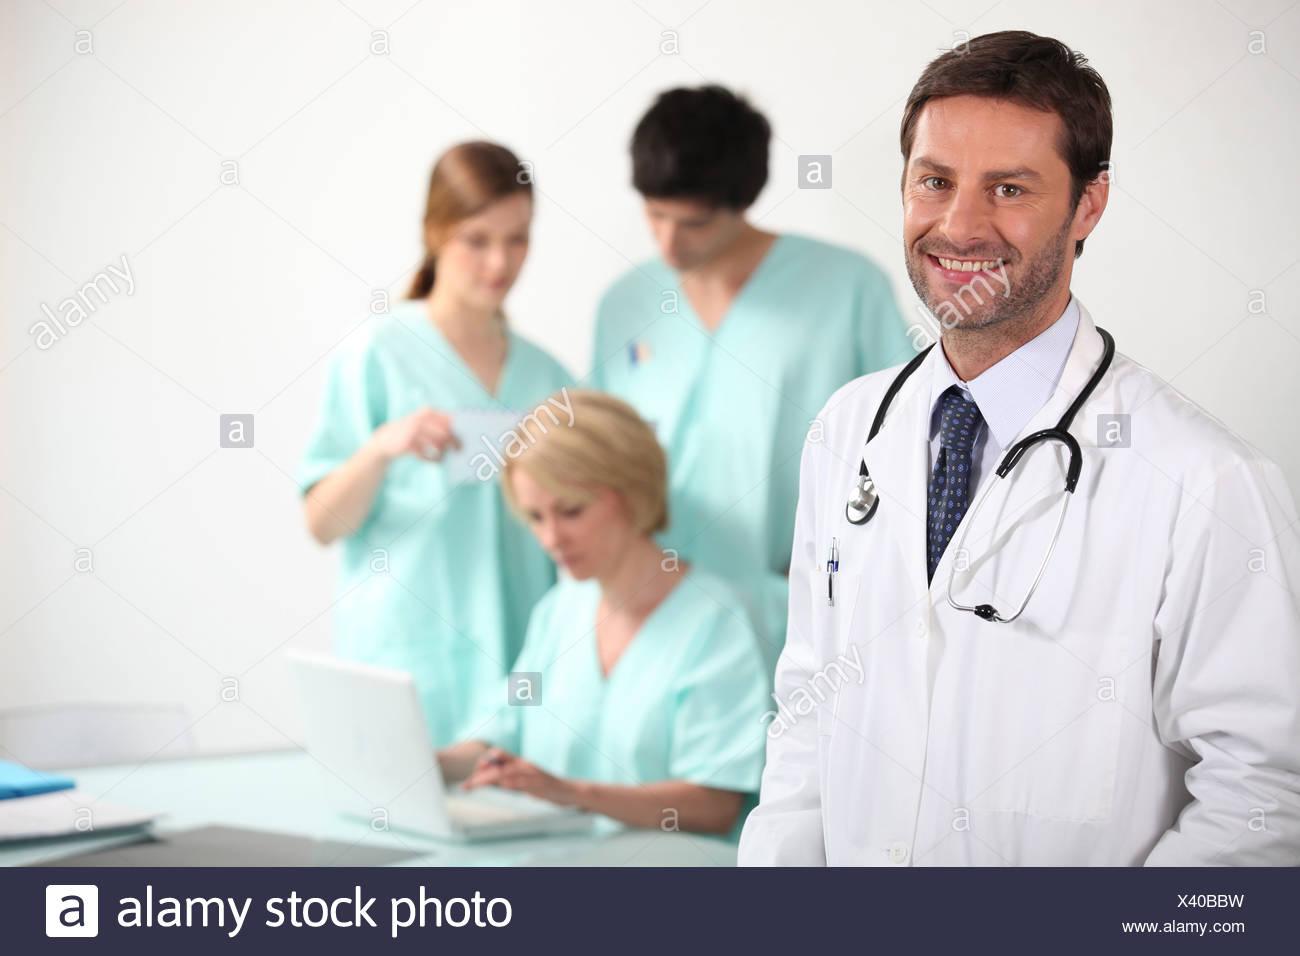 Bbw Nurse doctor and nurses stock photo: 277833469 - alamy